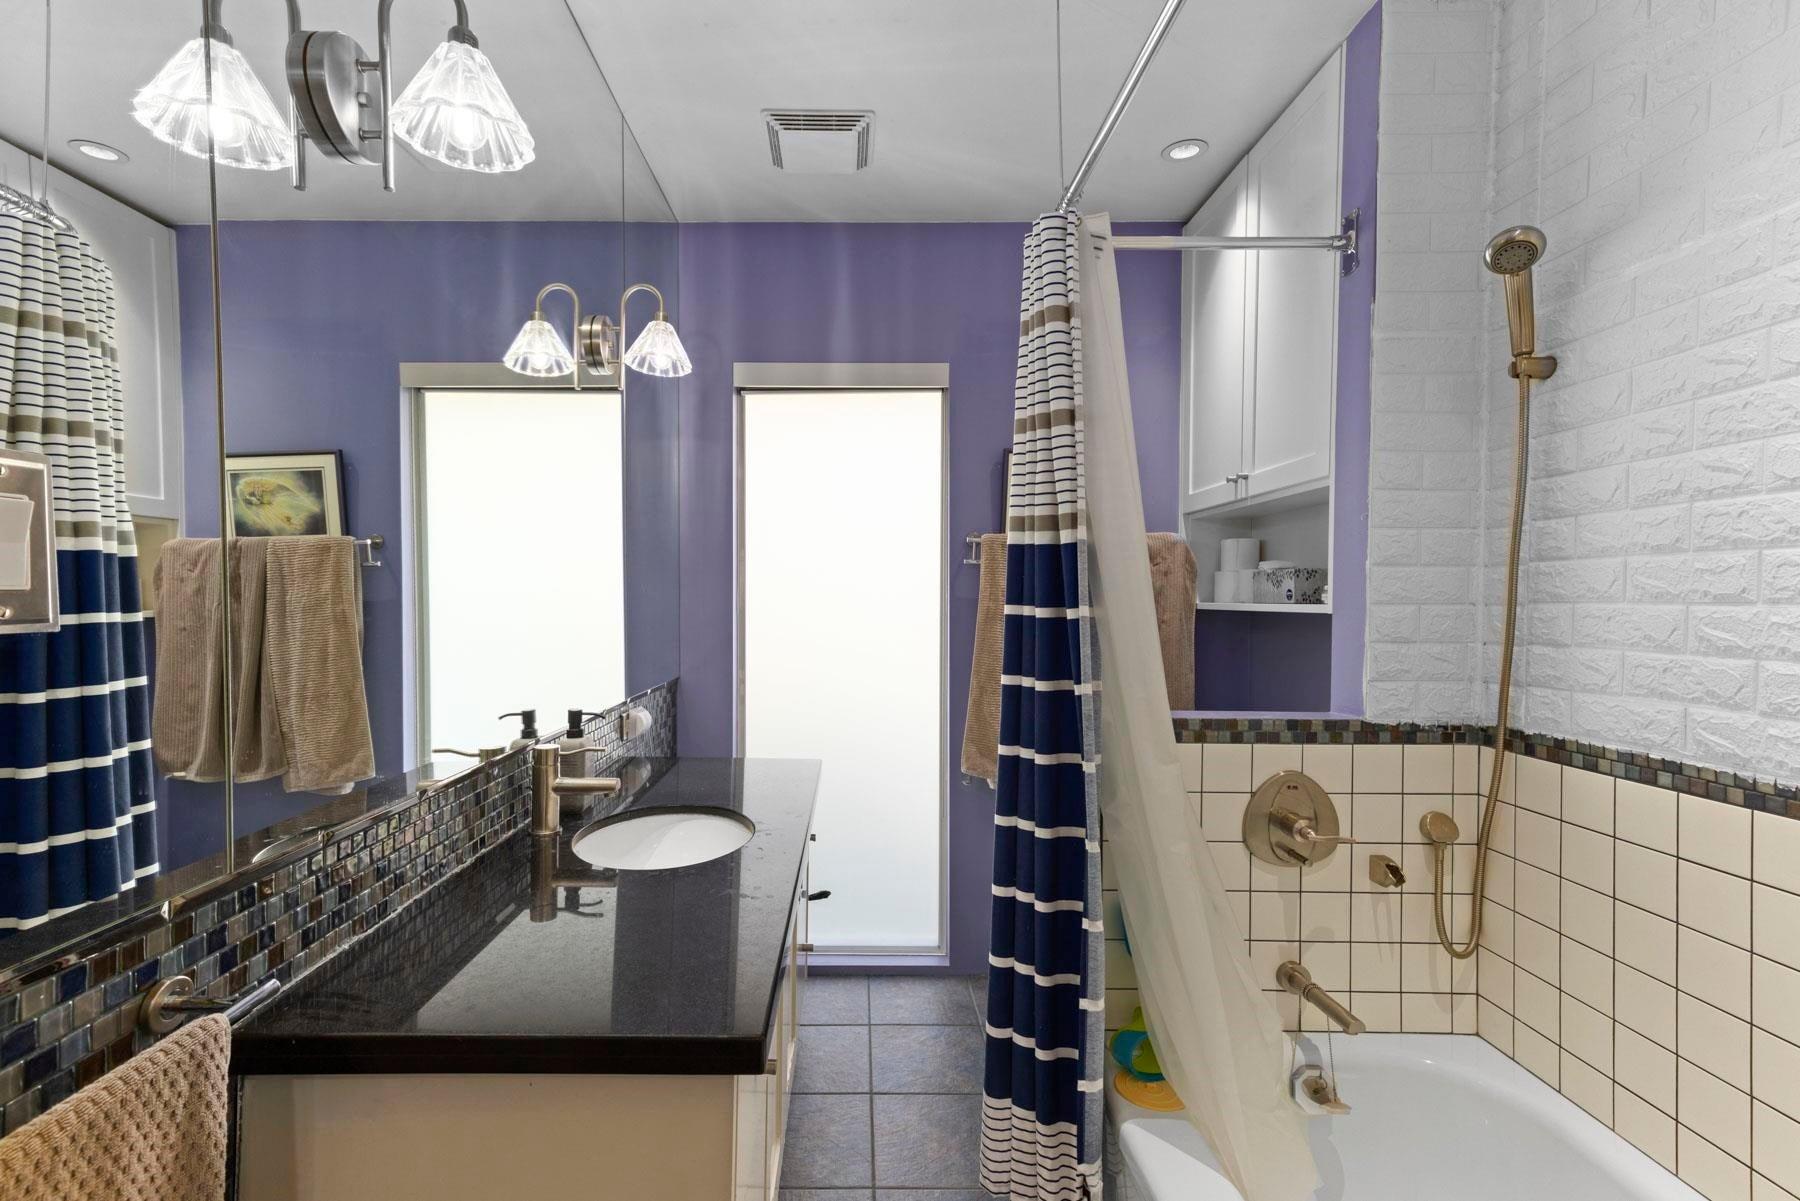 1036 GRAND BOULEVARD - Boulevard House/Single Family for sale, 5 Bedrooms (R2616987) - #16